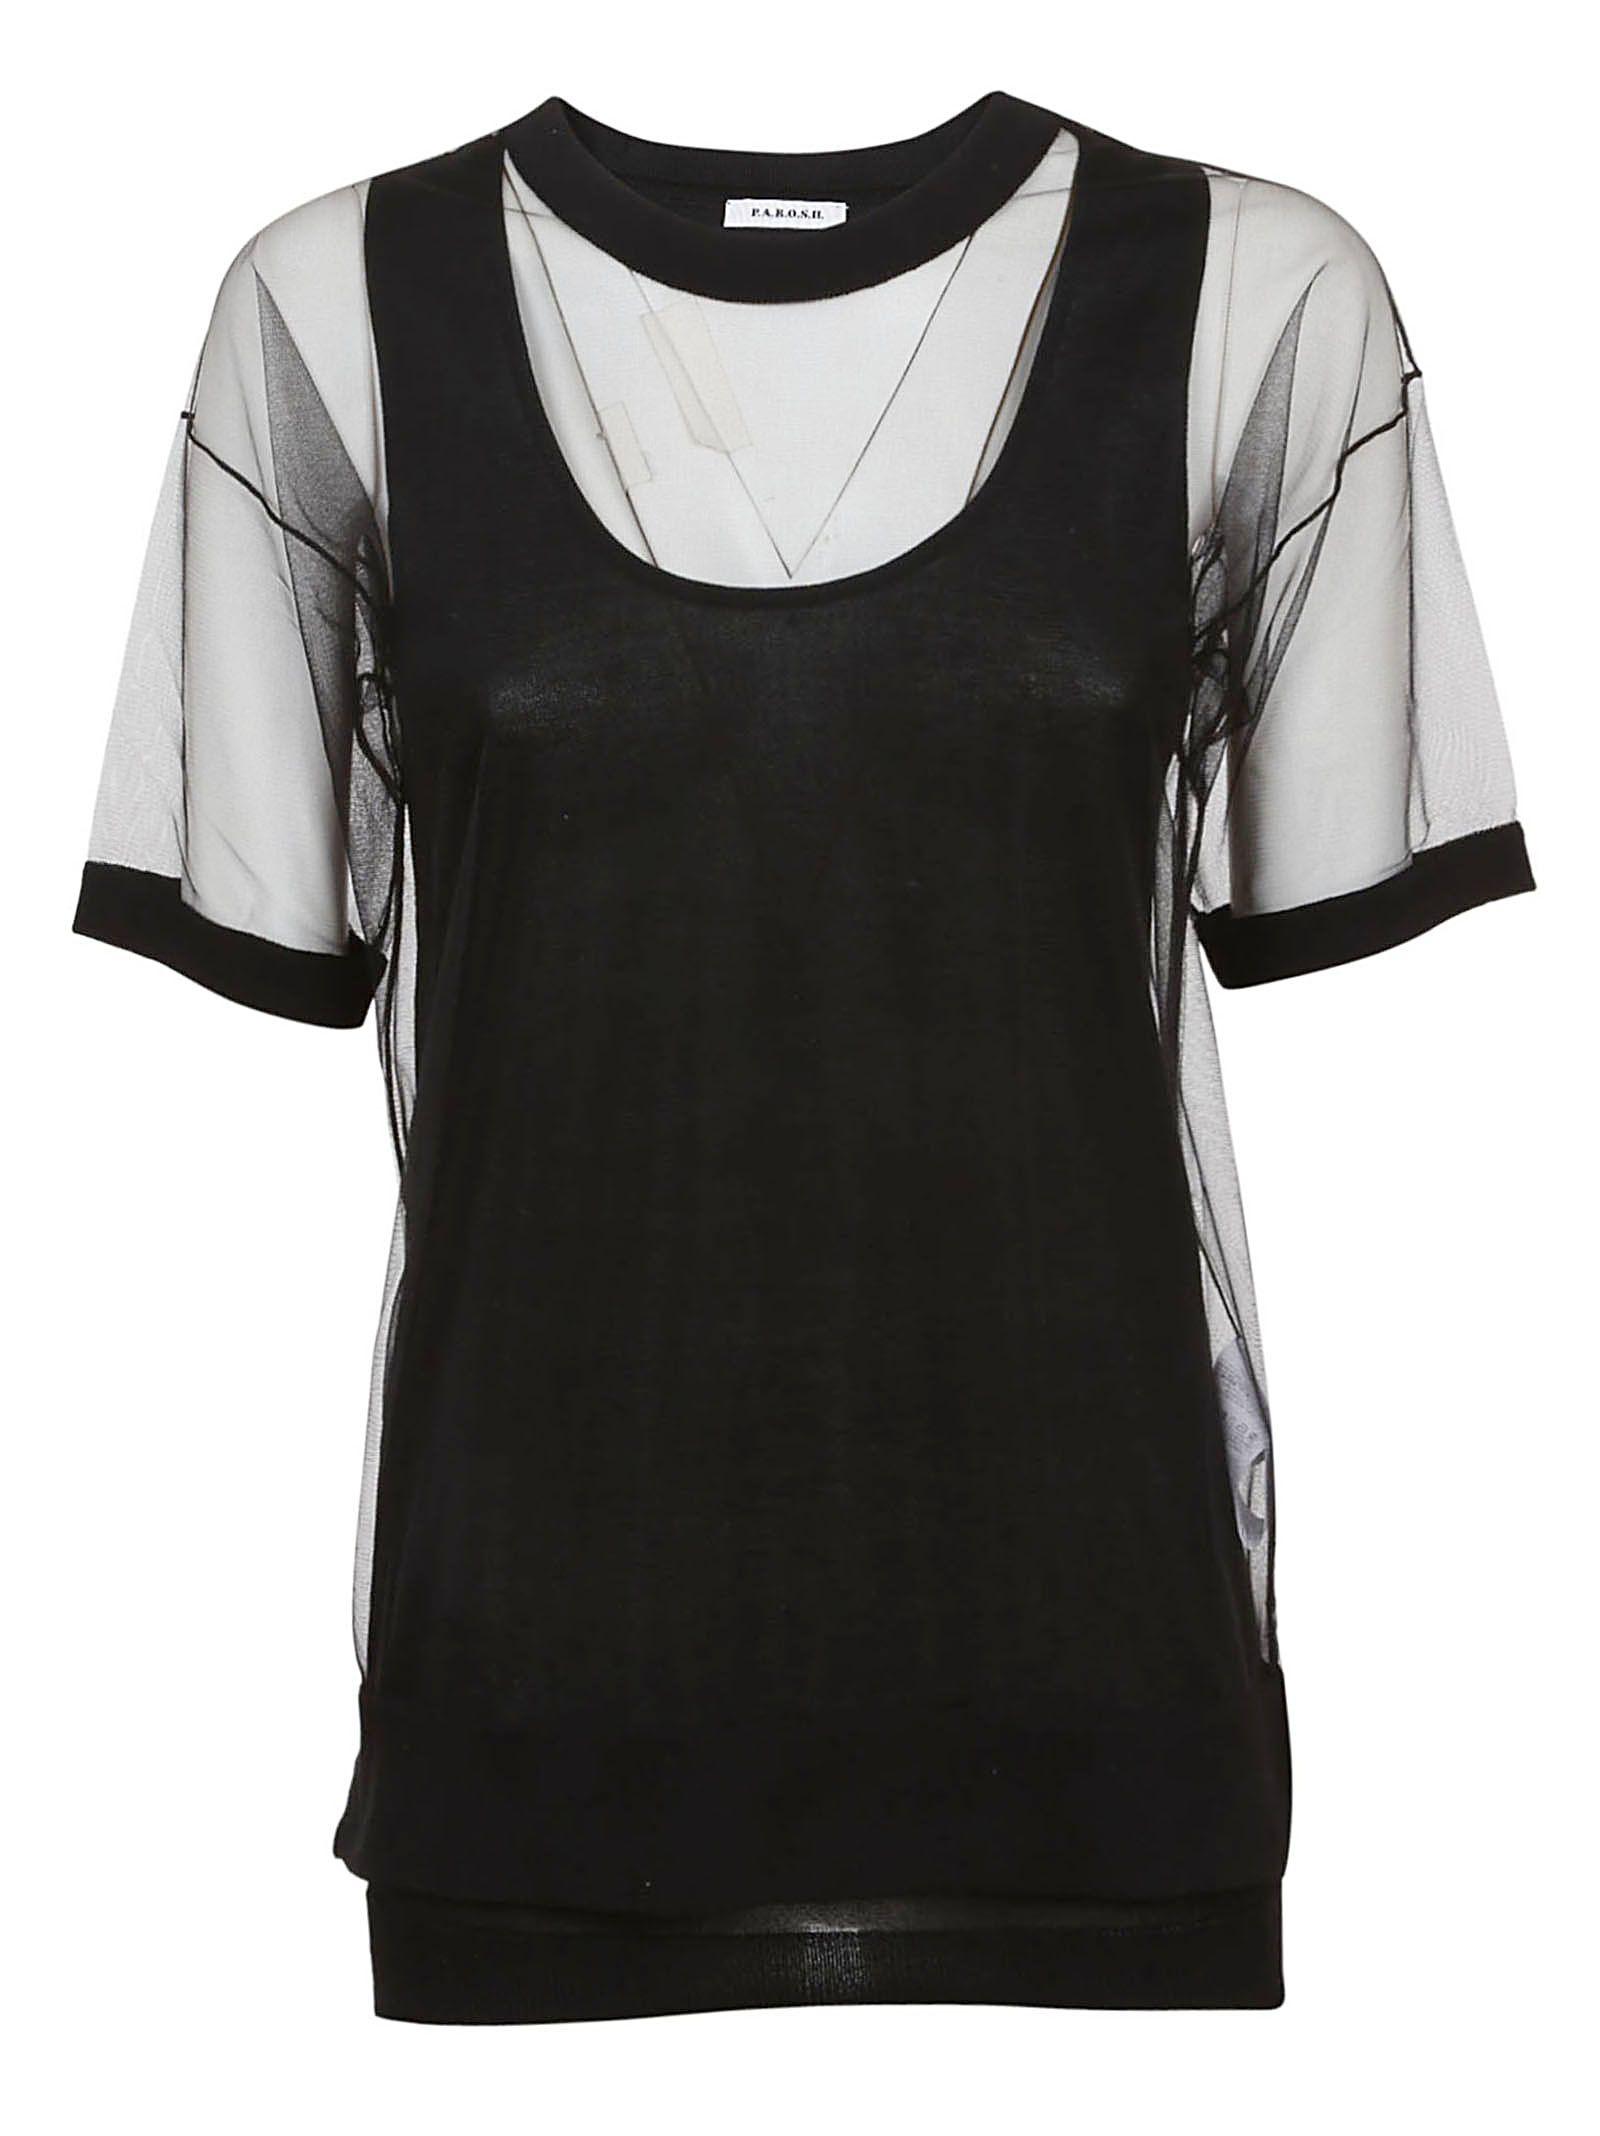 Parosh Lace Insert T-shirt